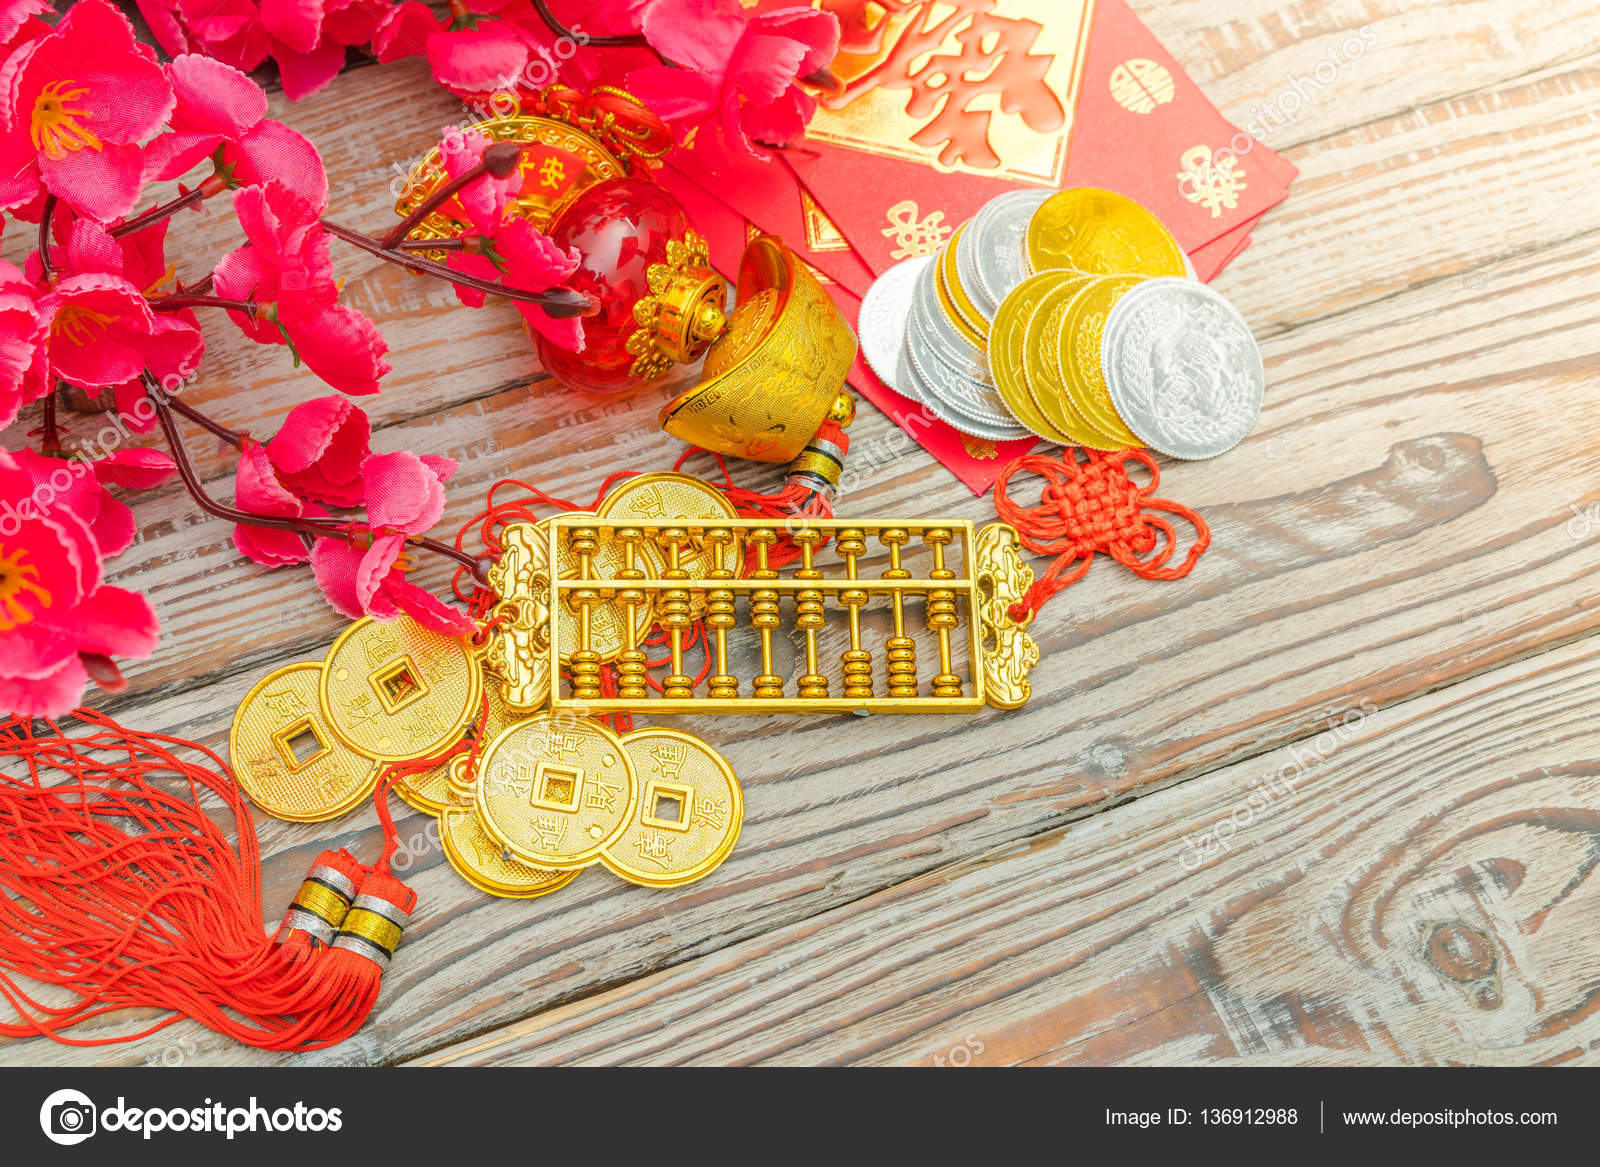 Fantastic Chinese New Year Wall Decoration Image - Wall Art ...